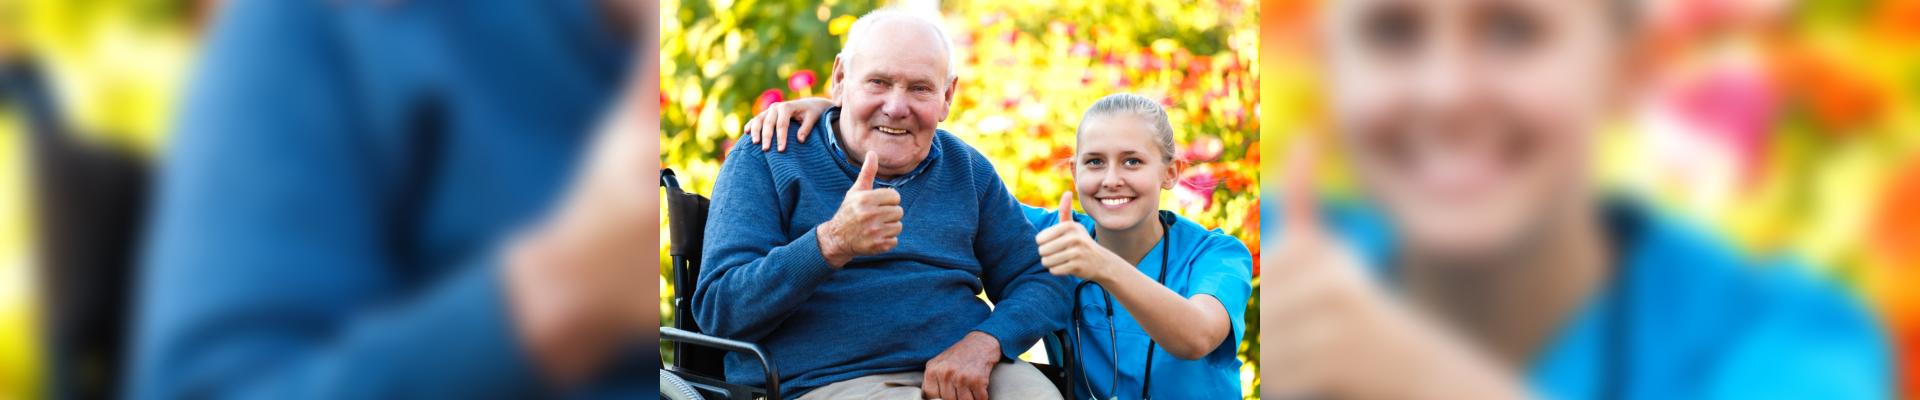 nurse and elderly patient smiling